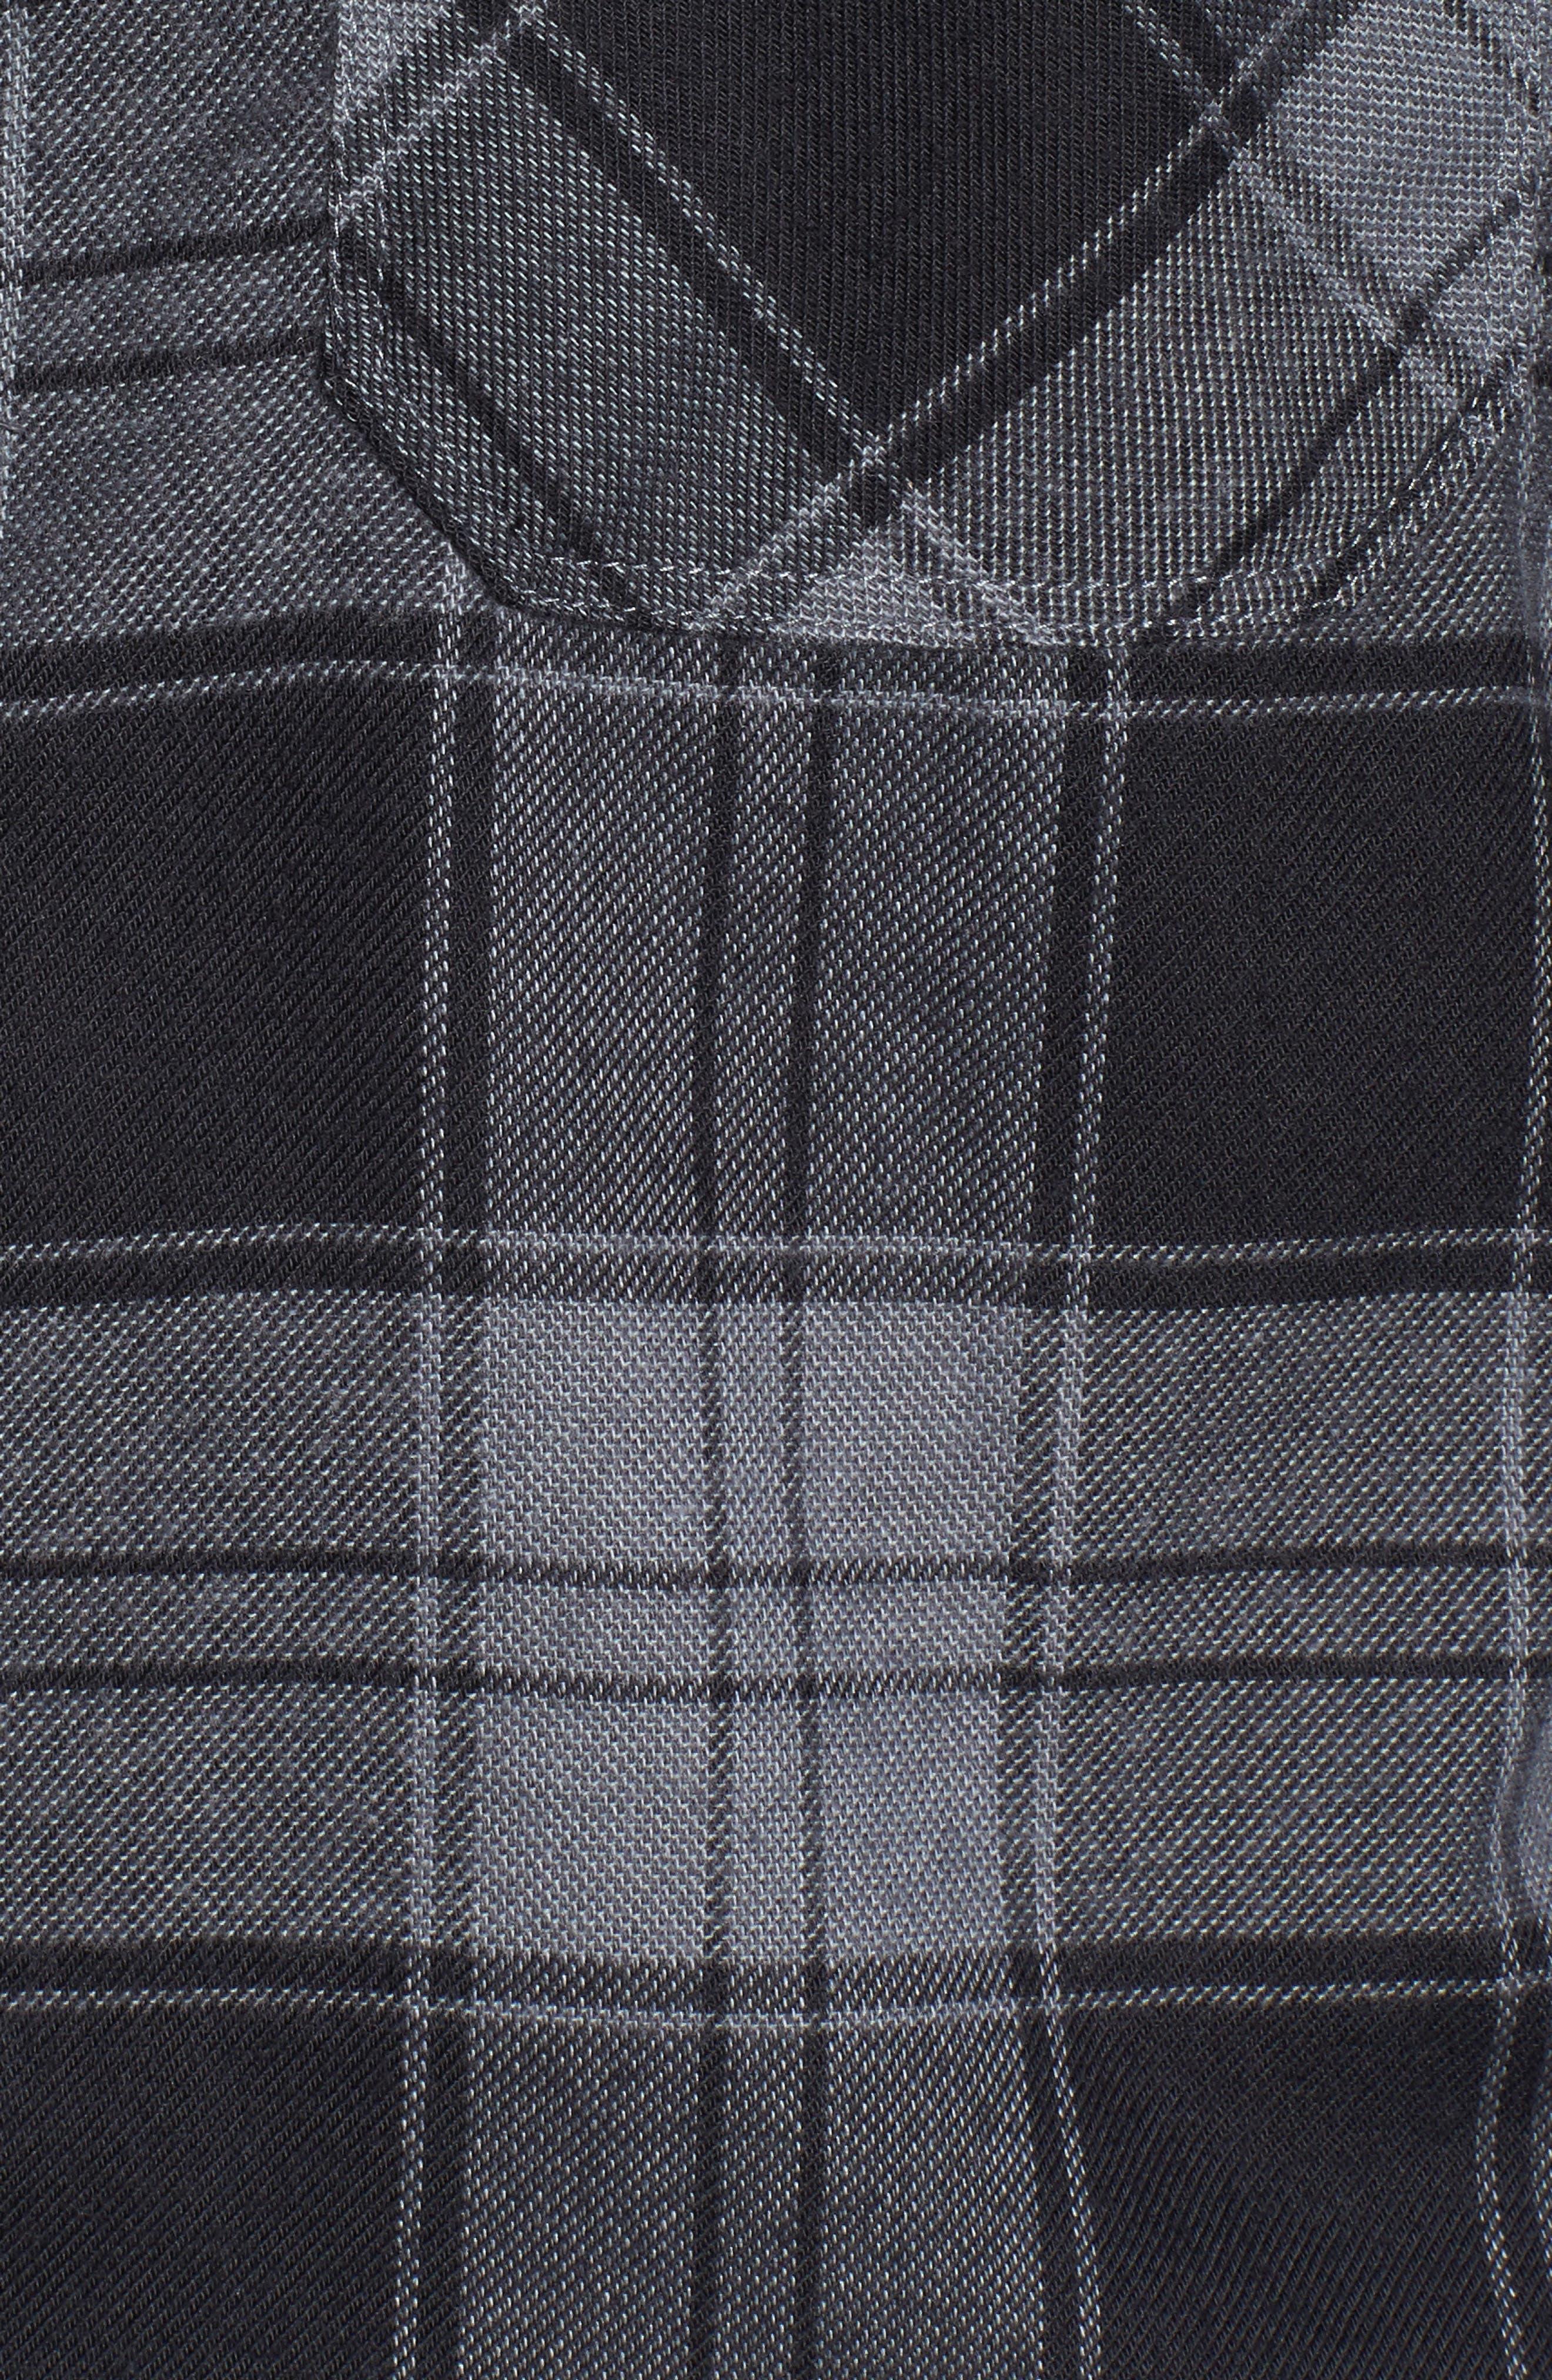 Alternate Image 5  - Hurley Check Dri-FIT Shirt